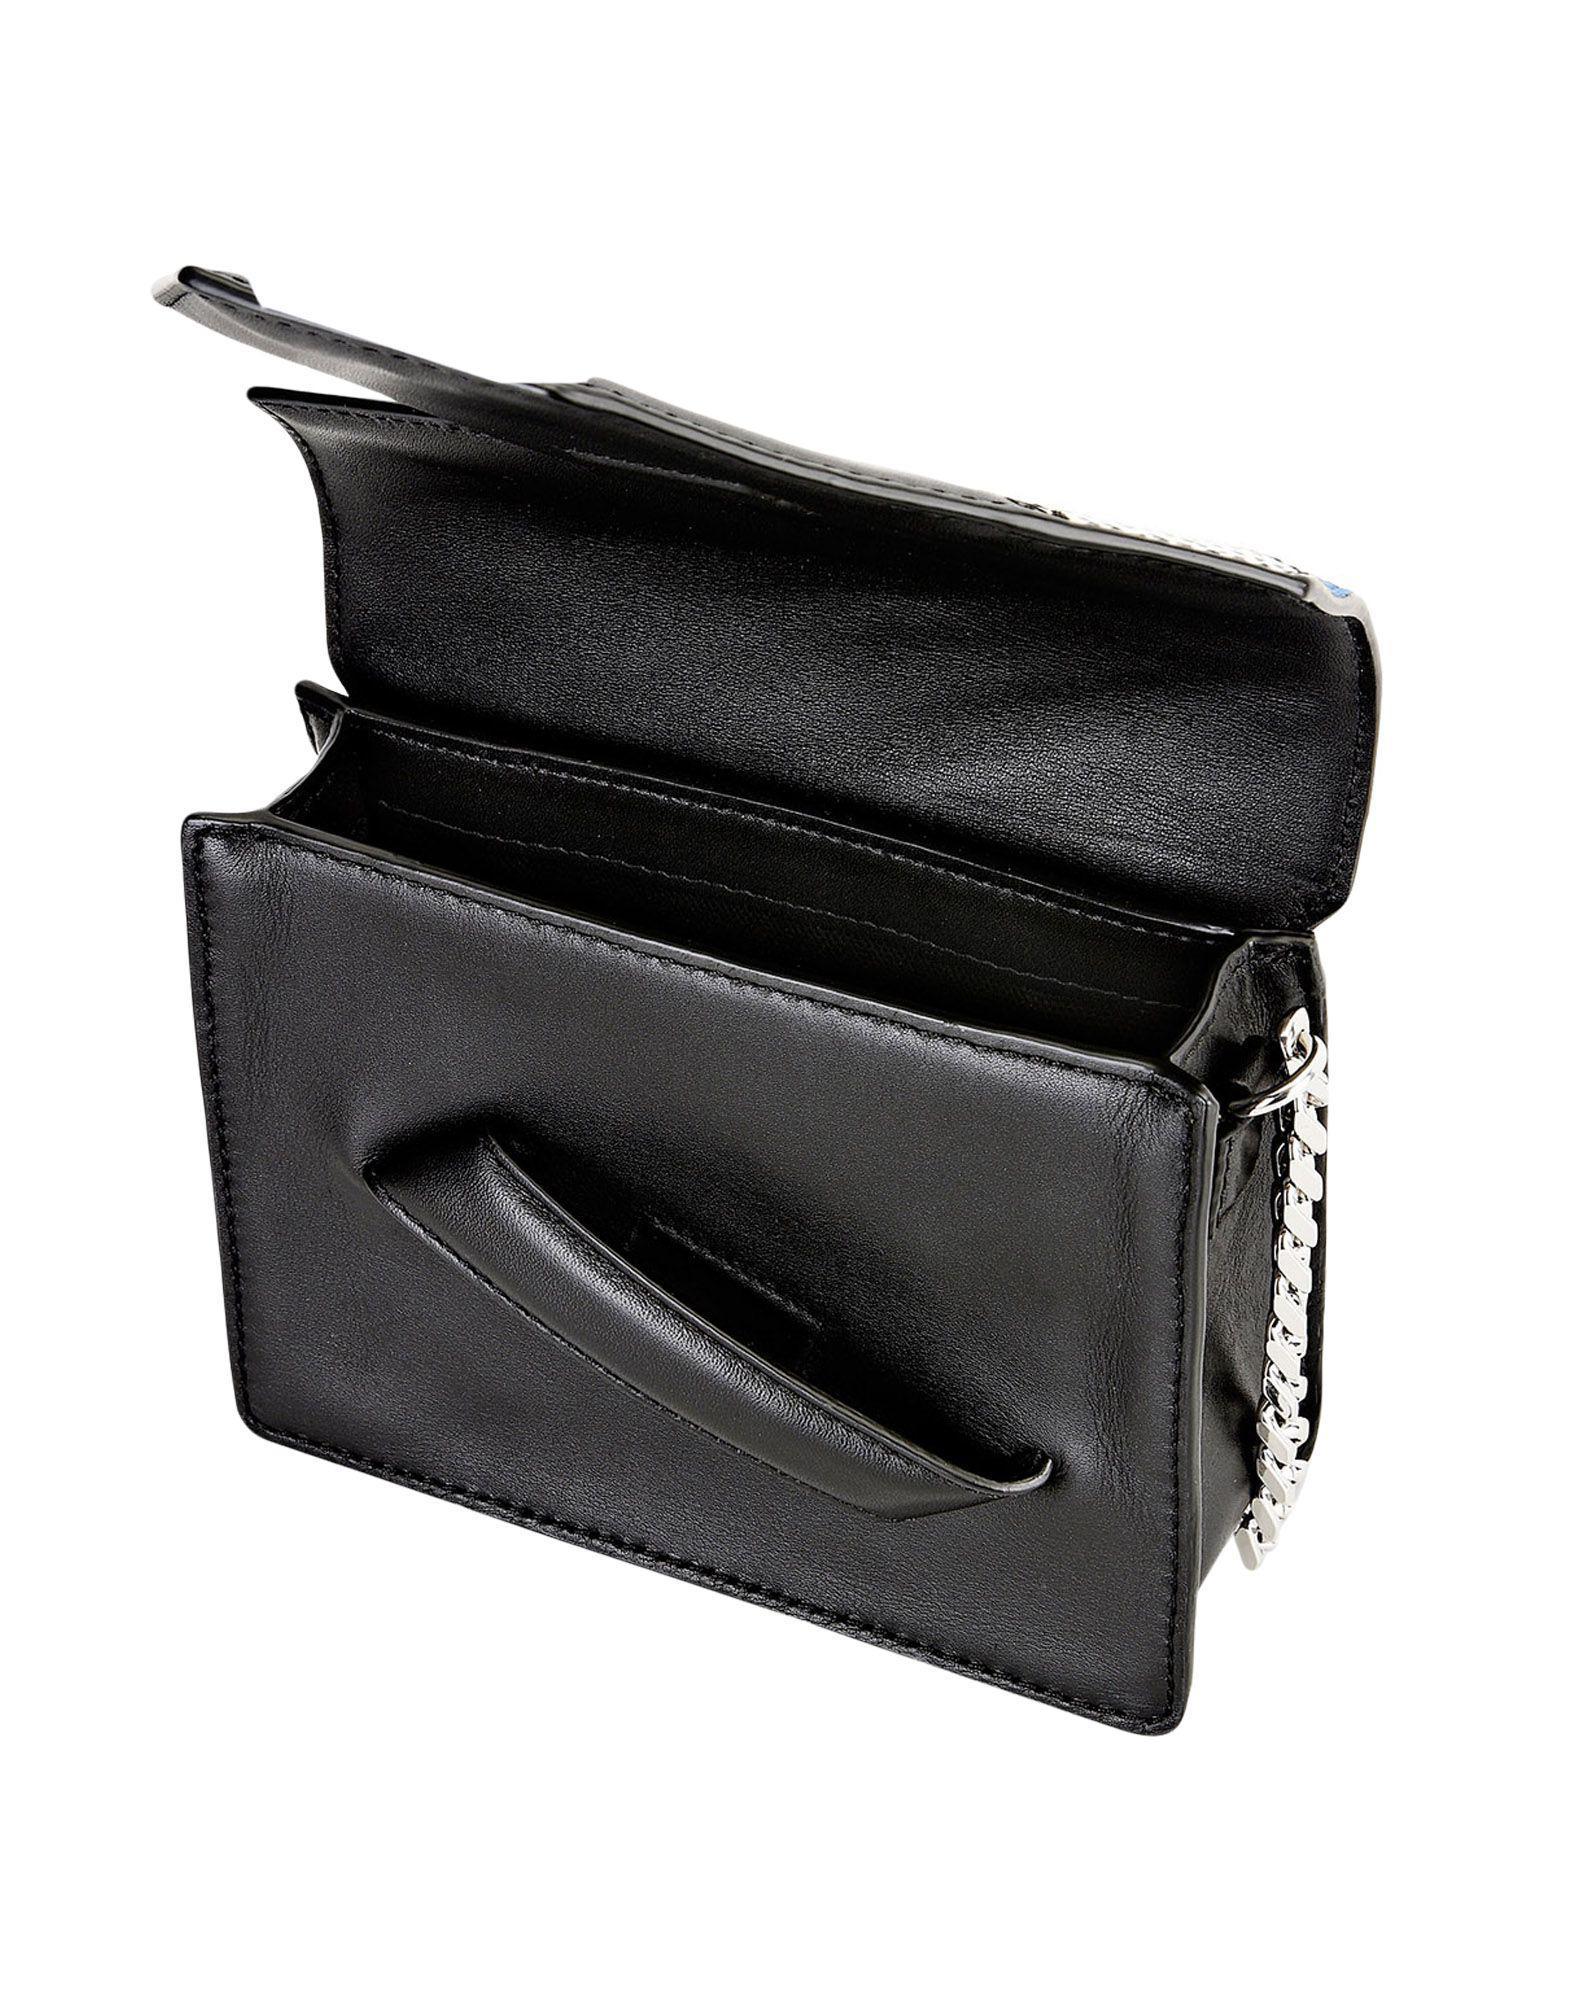 Karl Lagerfeld Leather Cross-body Bag in Blue